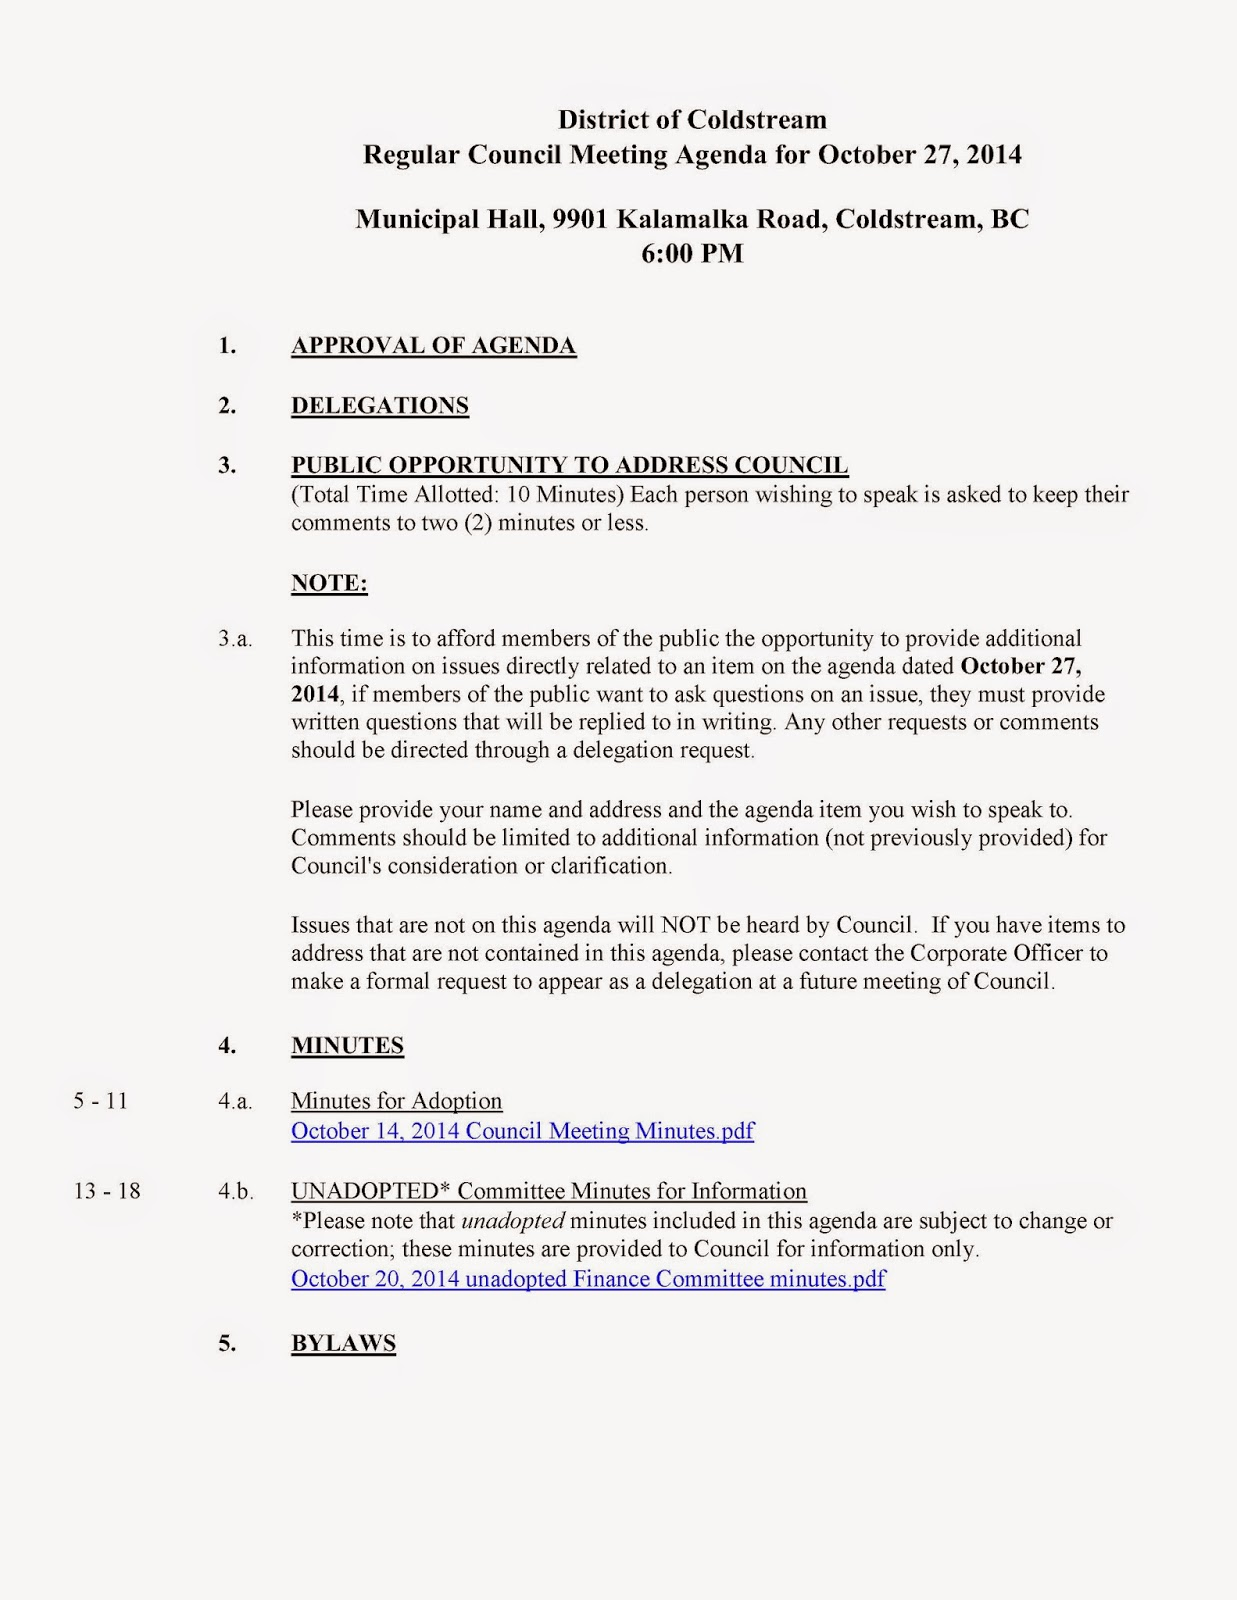 http://coldstream.civicweb.net/Documents/DocumentList.aspx?ID=18262